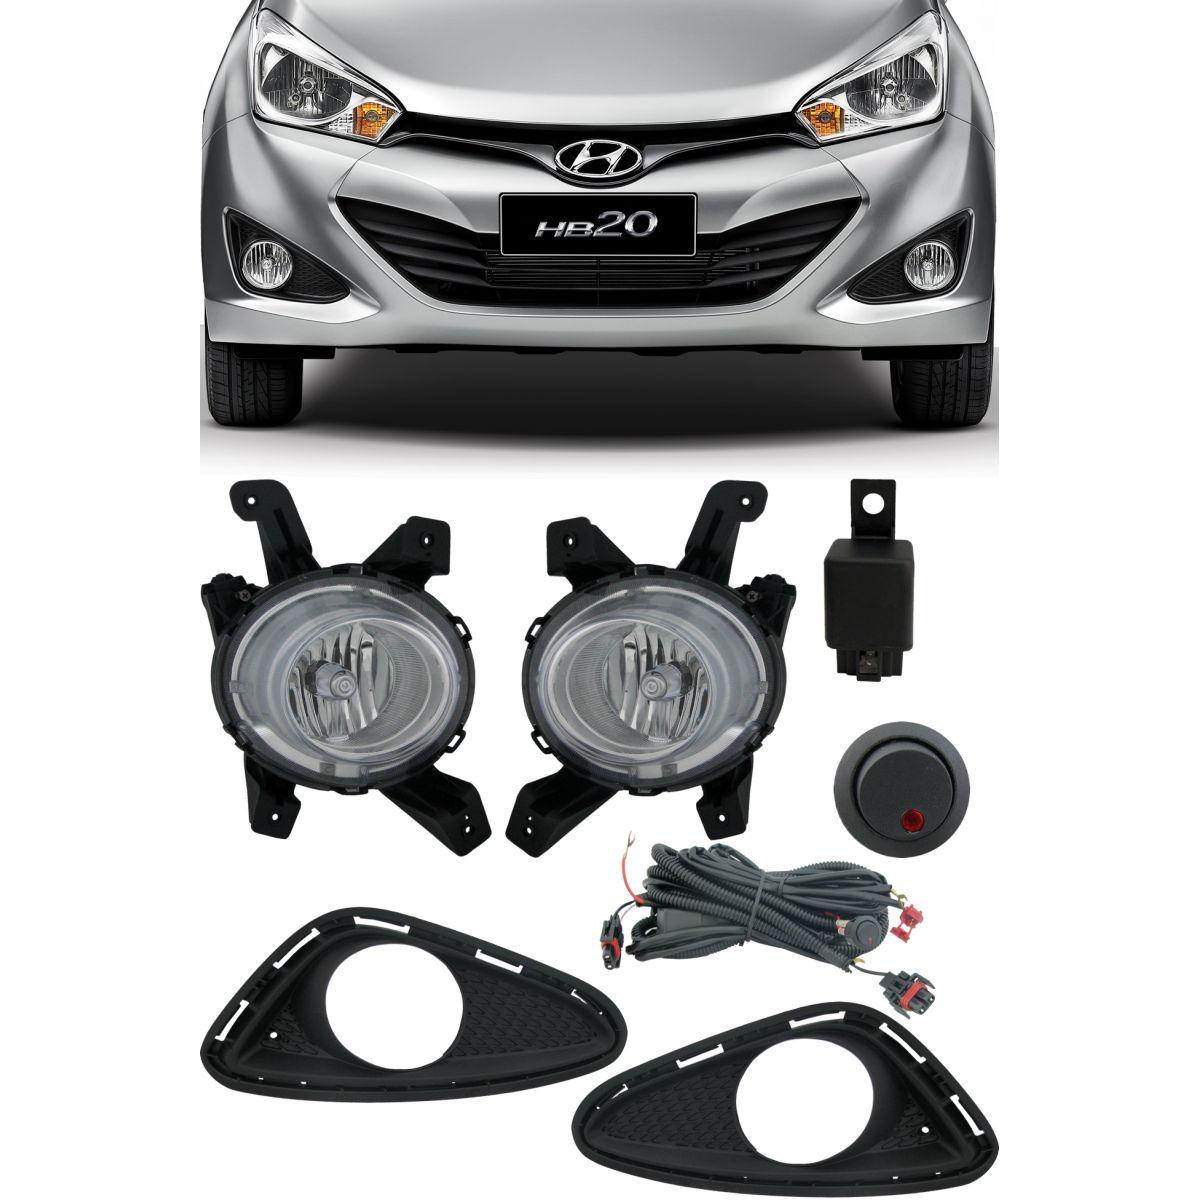 Kit Farol de Milha Neblina Hyundai HB20 2012 á 2015 com Interruptor Alternativo + Molduras